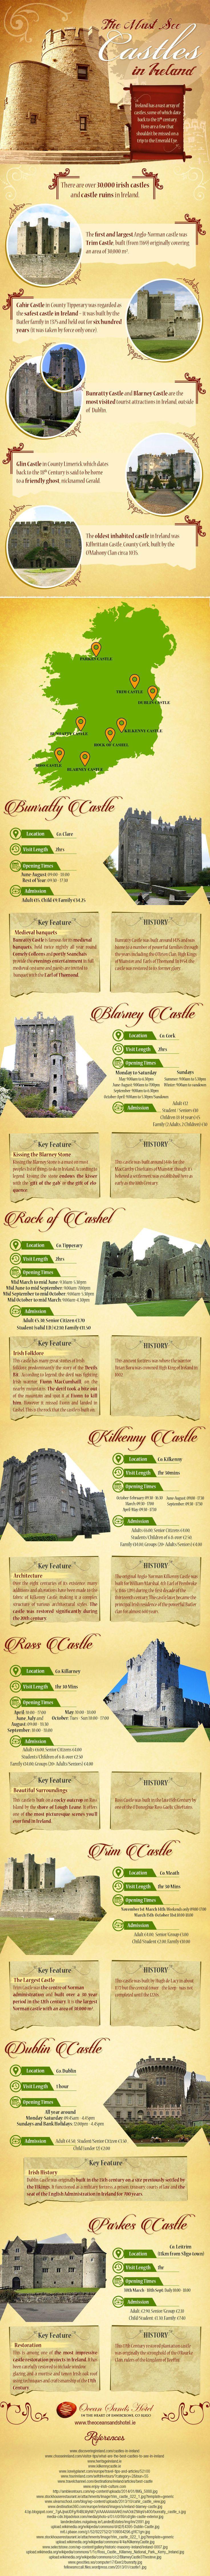 Most popular castles in Ireland